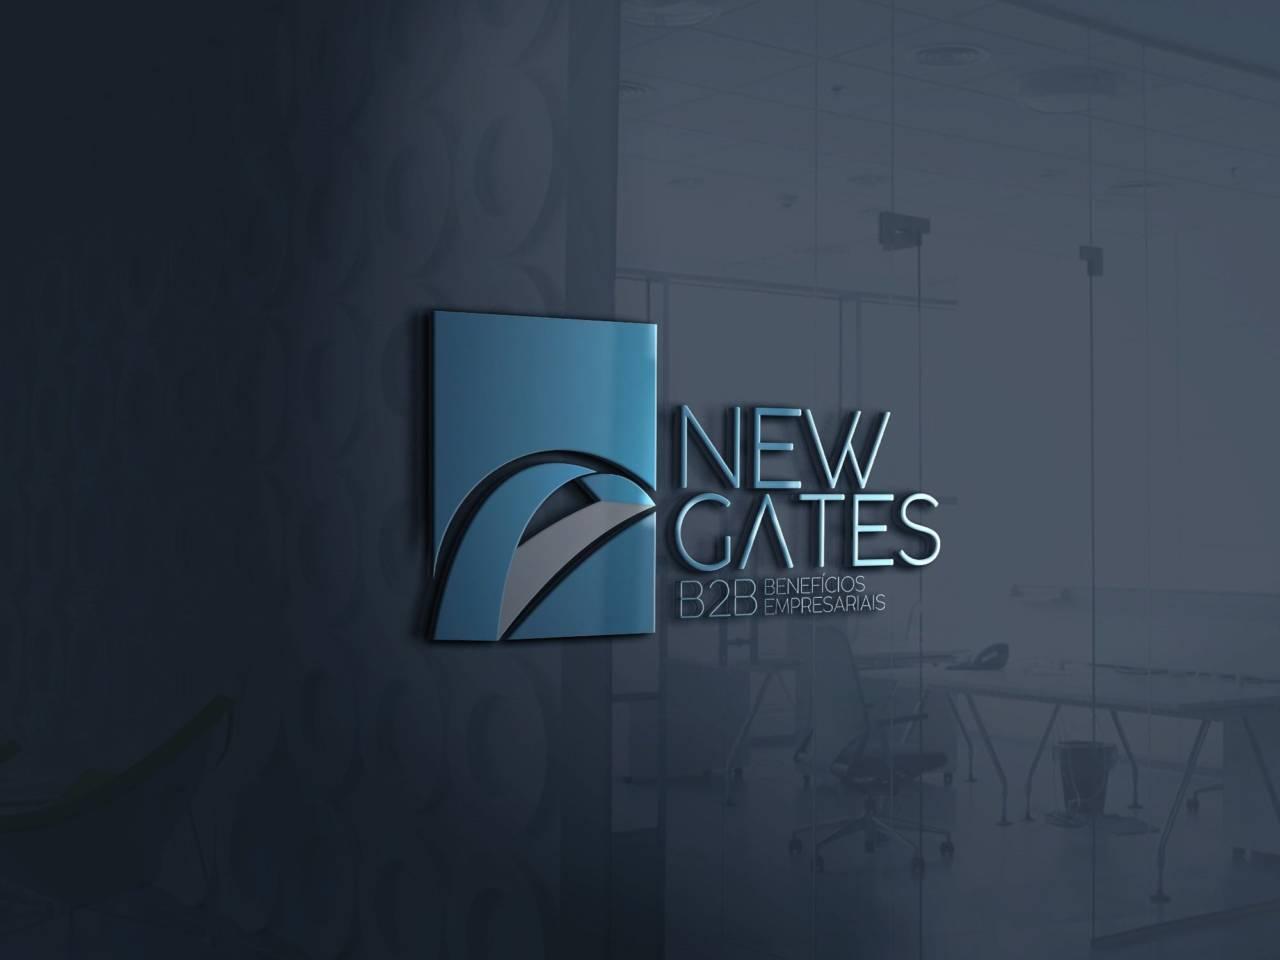 New Gates B2B